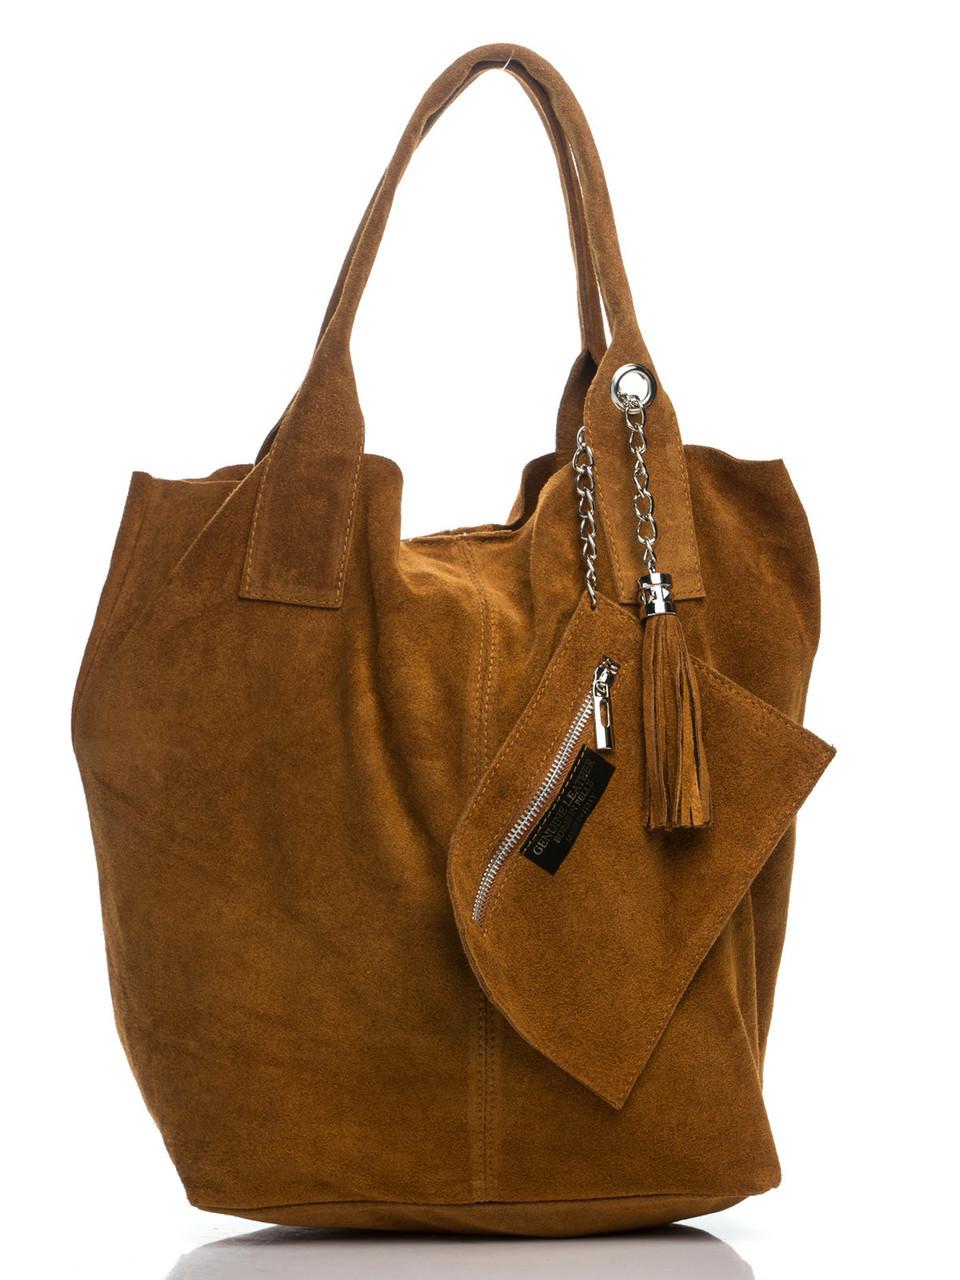 Кожаная сумка хаки типа шопер ARIANNA Diva's Bag коньячная 27 см х 36 см х 18 см